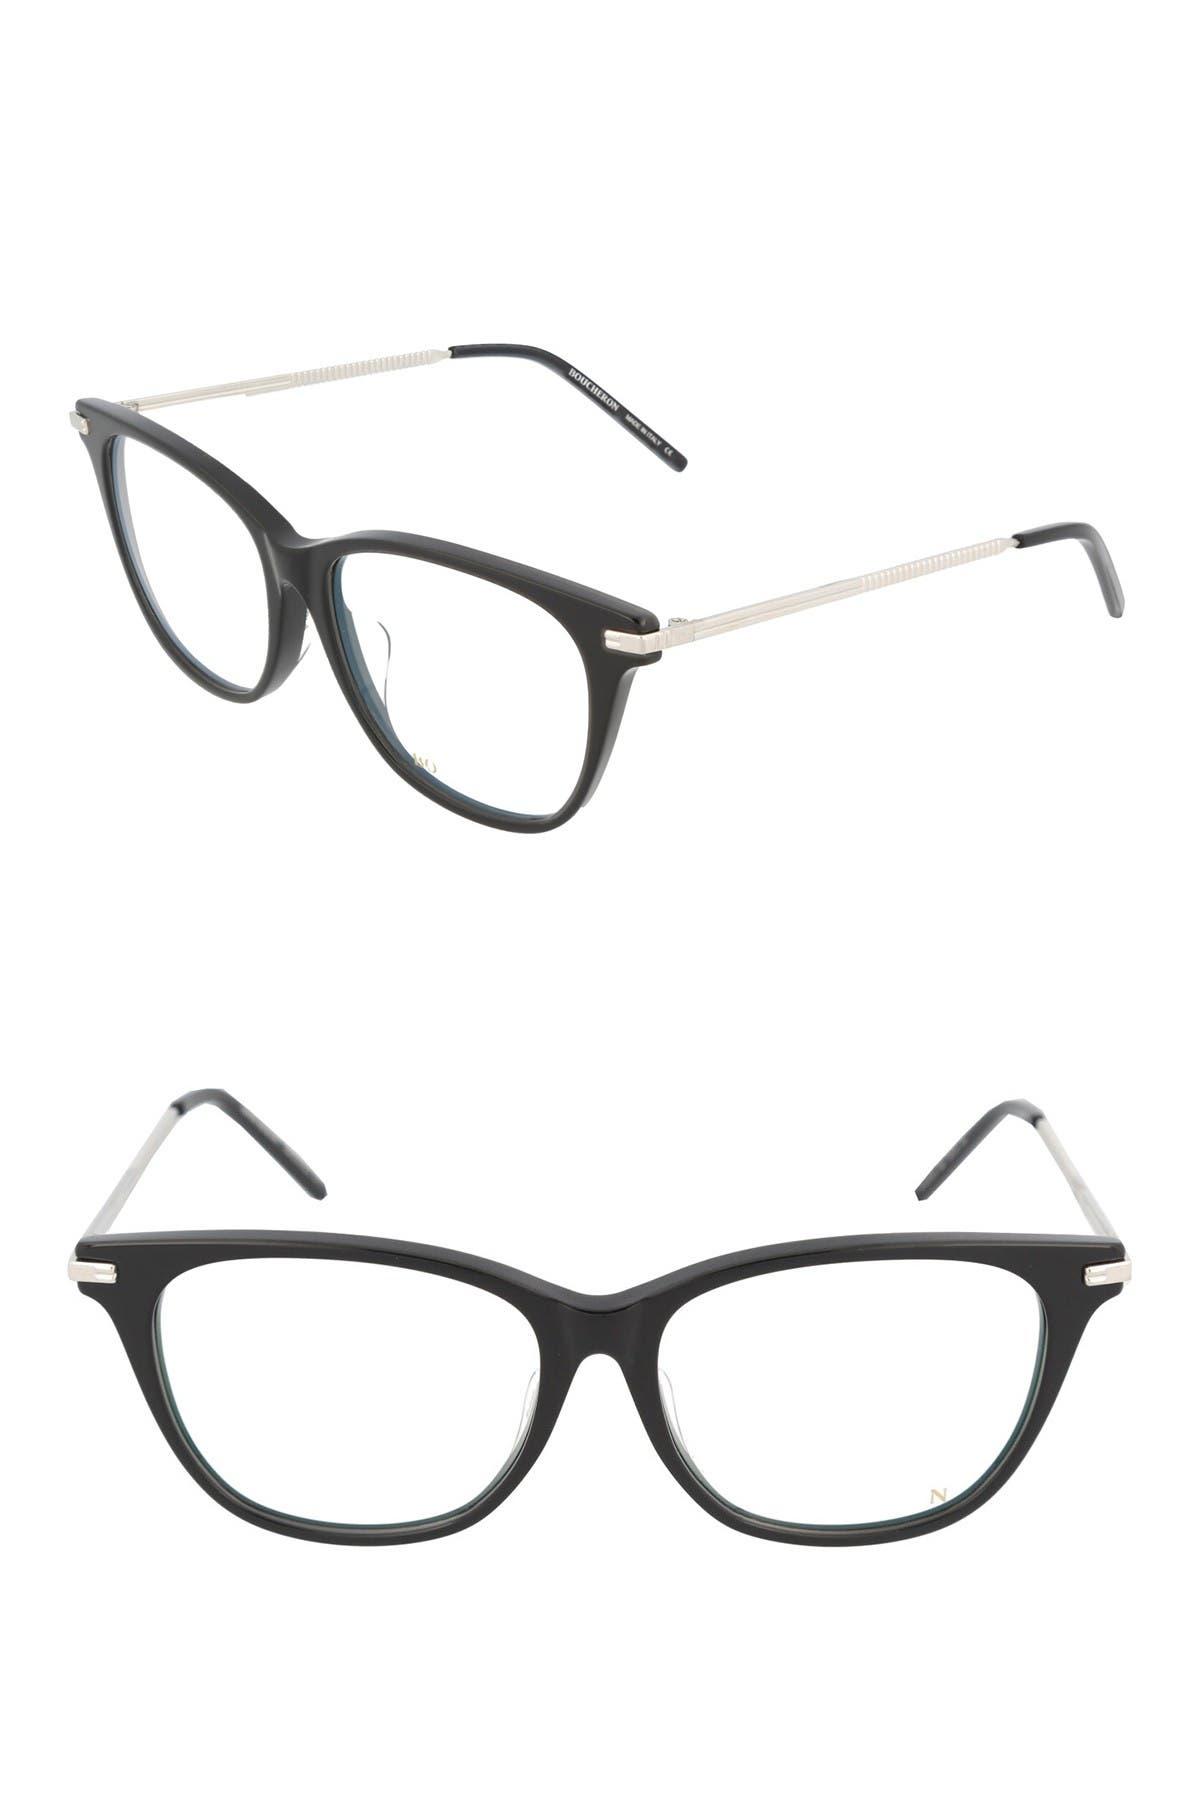 Image of Boucheron 54mm Square Cat Eye Optical Frames